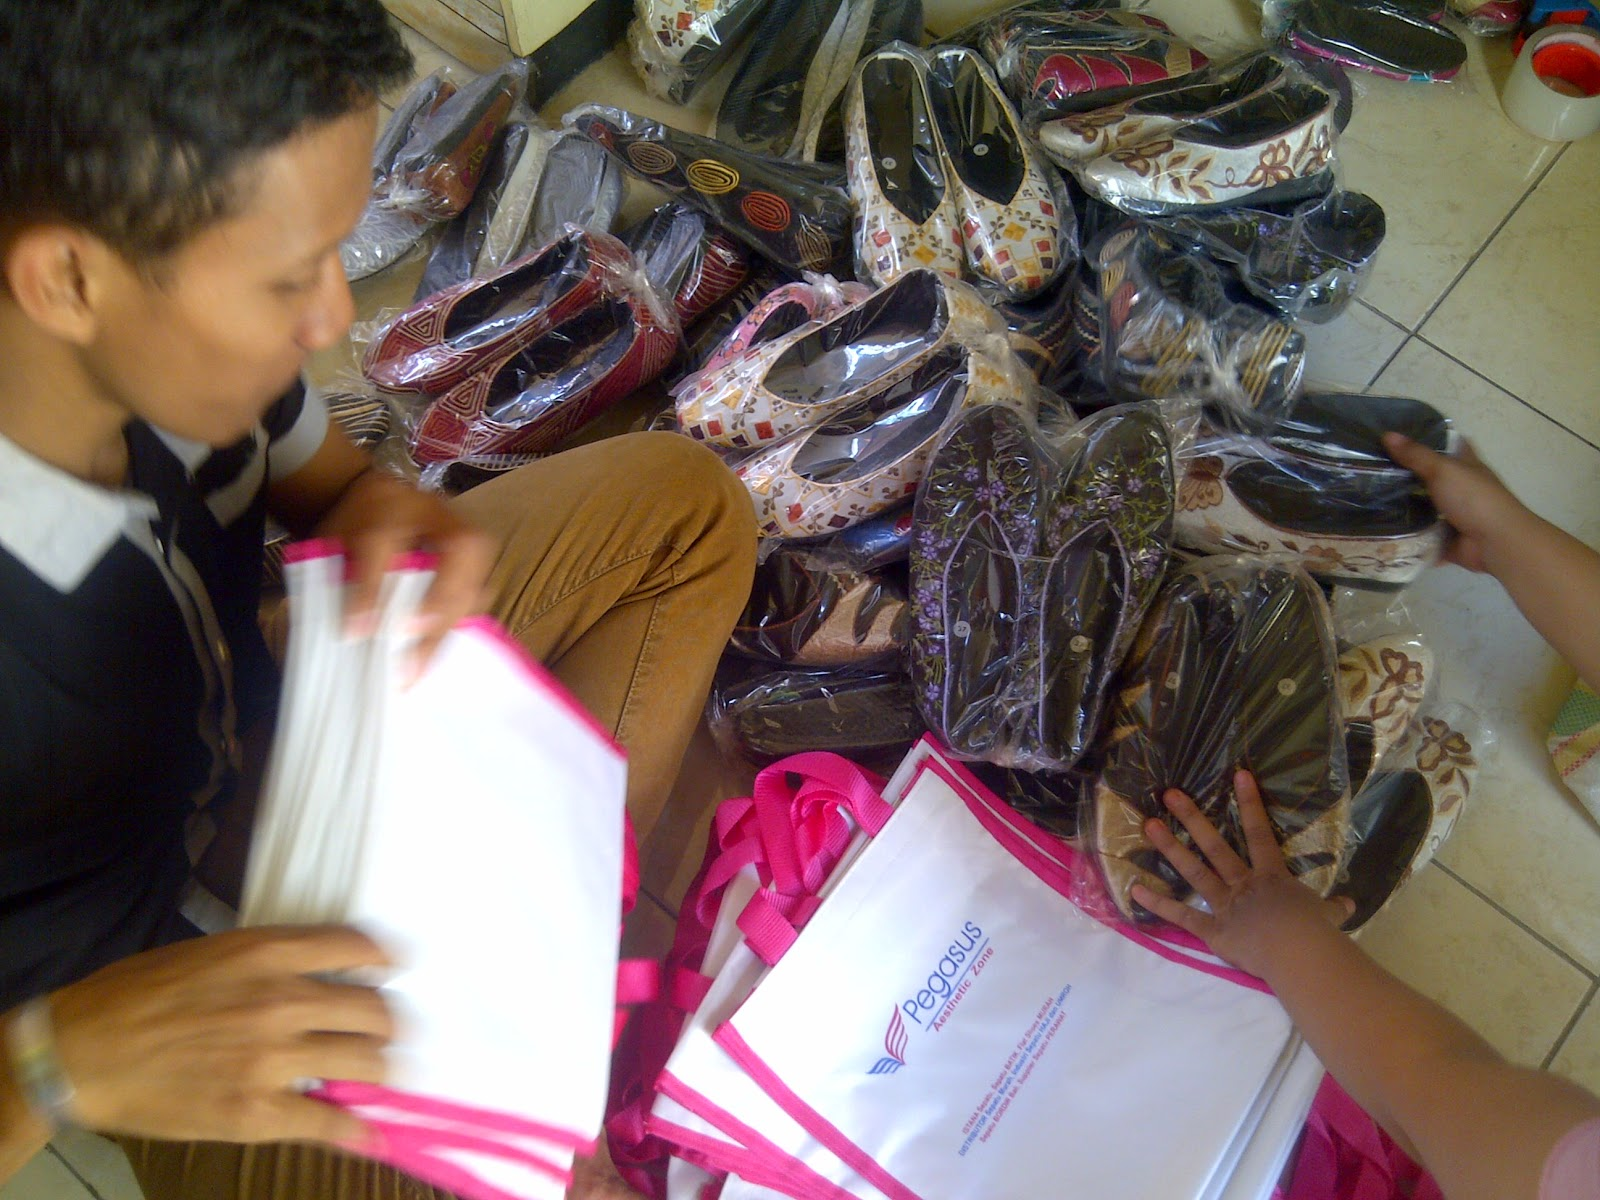 Grosir Sepatu Bordir Murah, Produsen Sepatu Bordir Murah, Grosir Sepatu Bordir Jogja, www.distributorsepatumurah.com